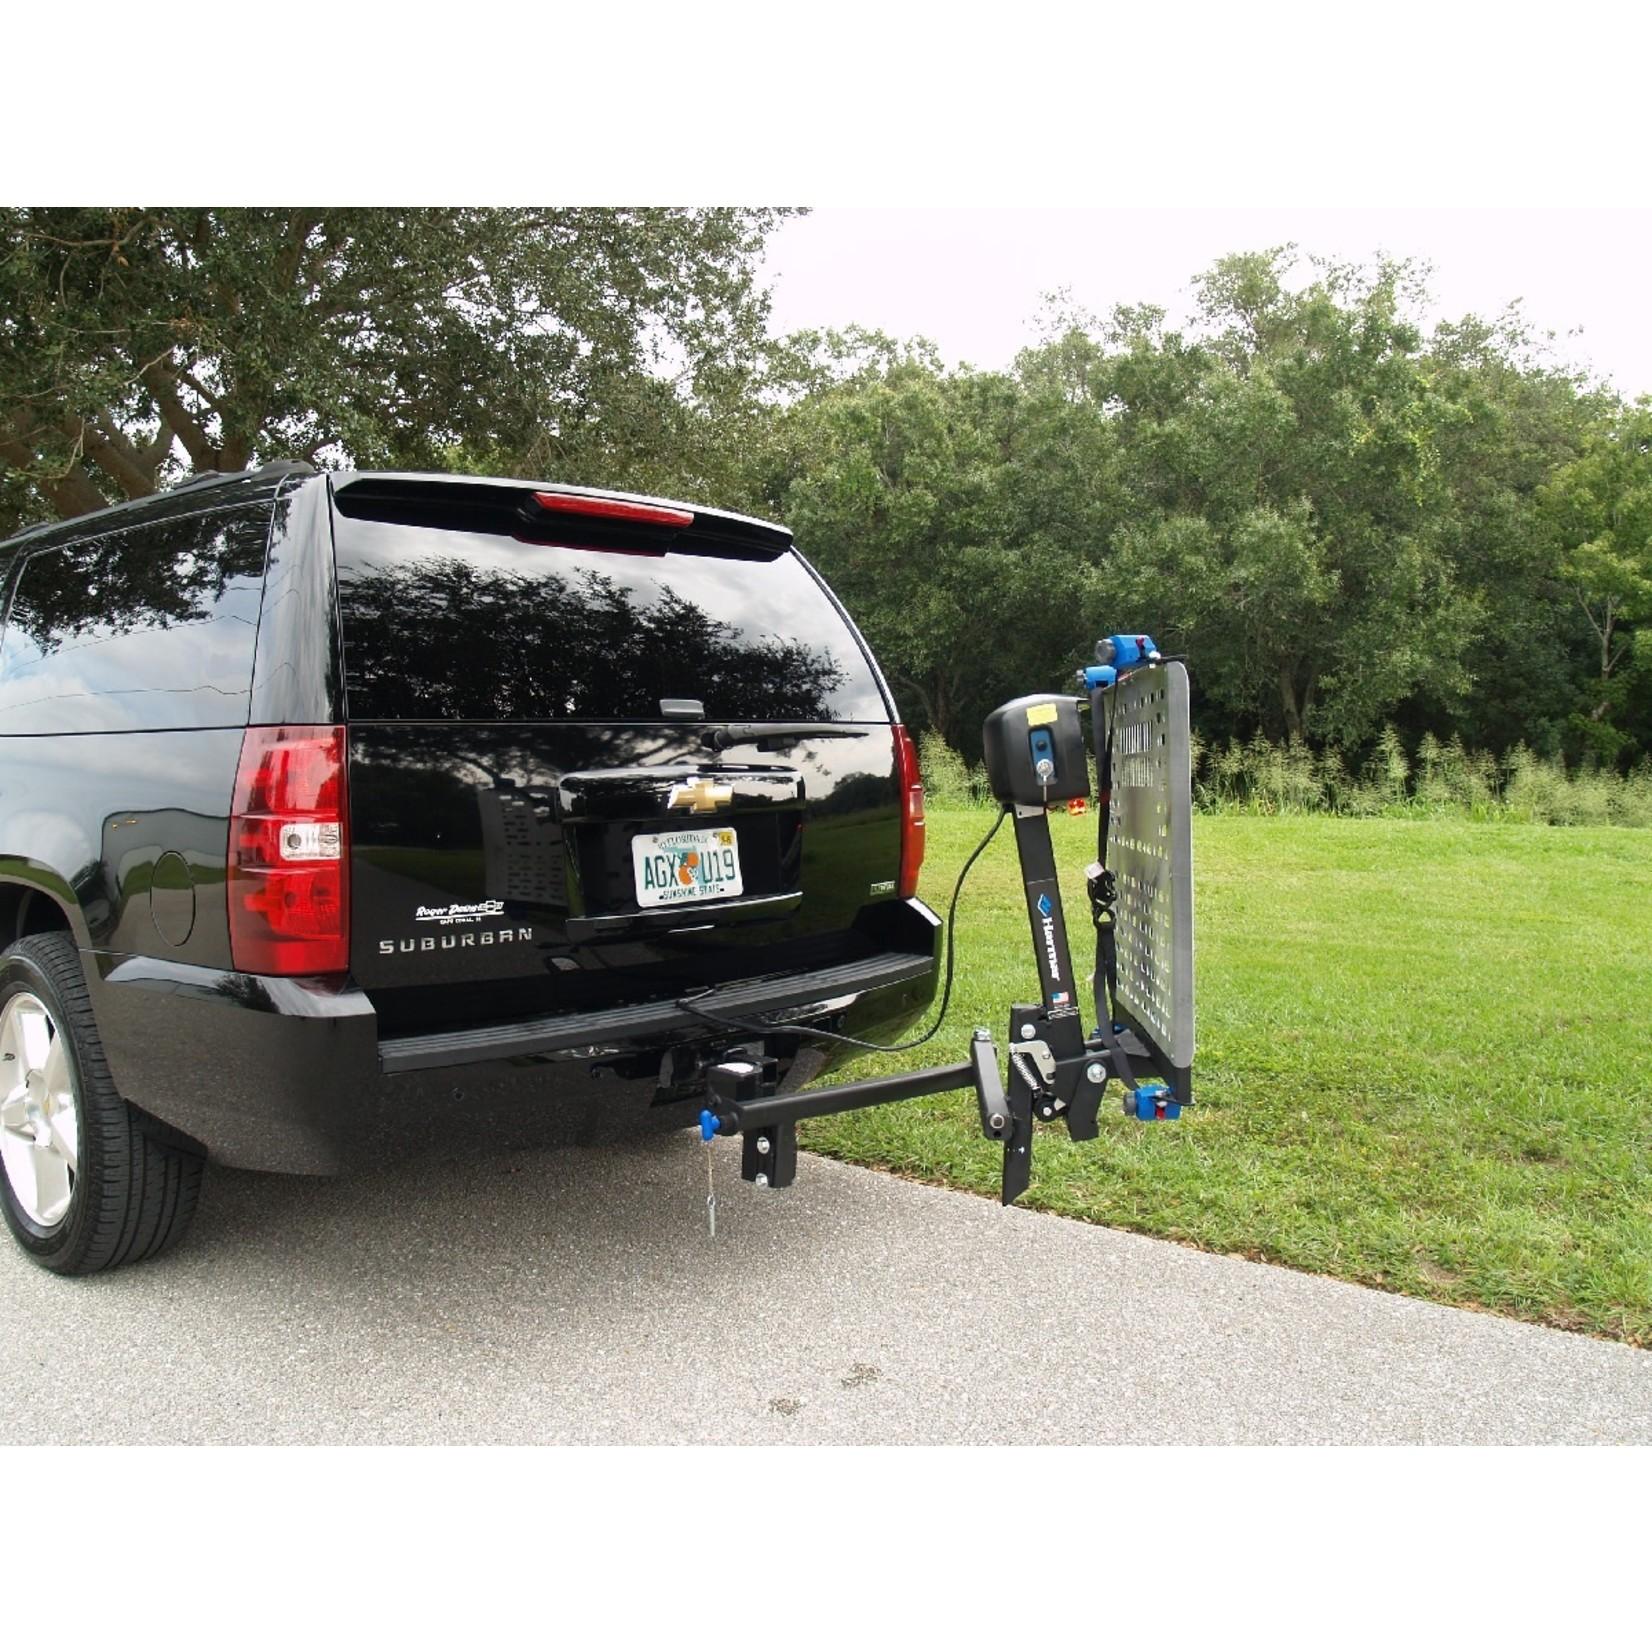 Harmar Mobility AL105 Swing-Away Lift